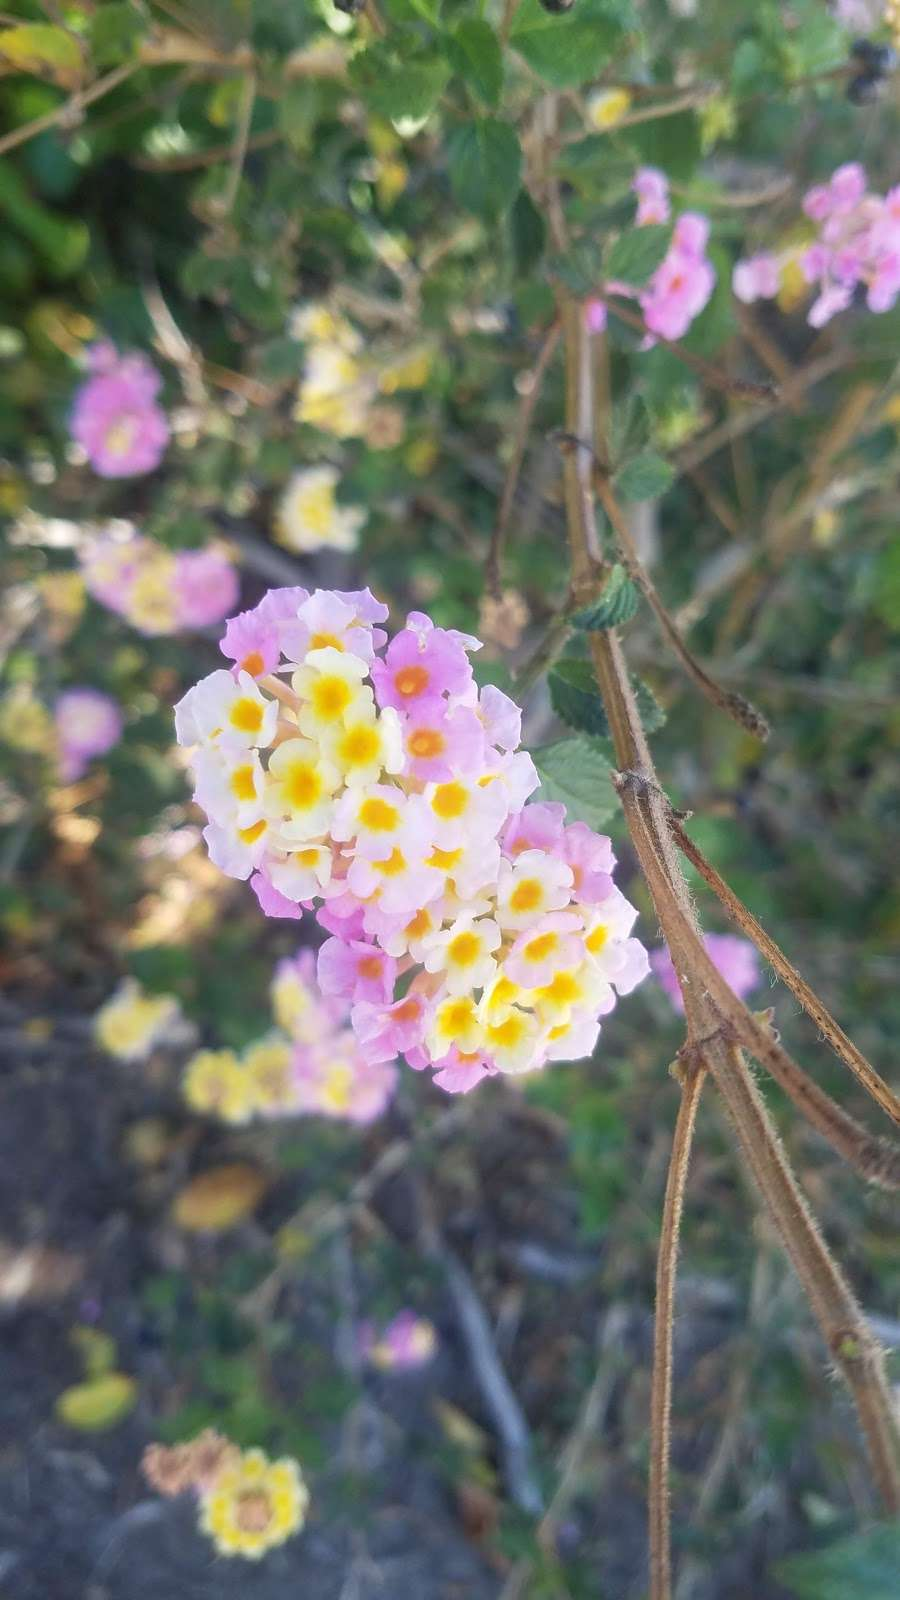 Paloma del Sol Rec 3 - park  | Photo 4 of 5 | Address: 31760 Calle Vimianzo, Temecula, CA 92592, USA